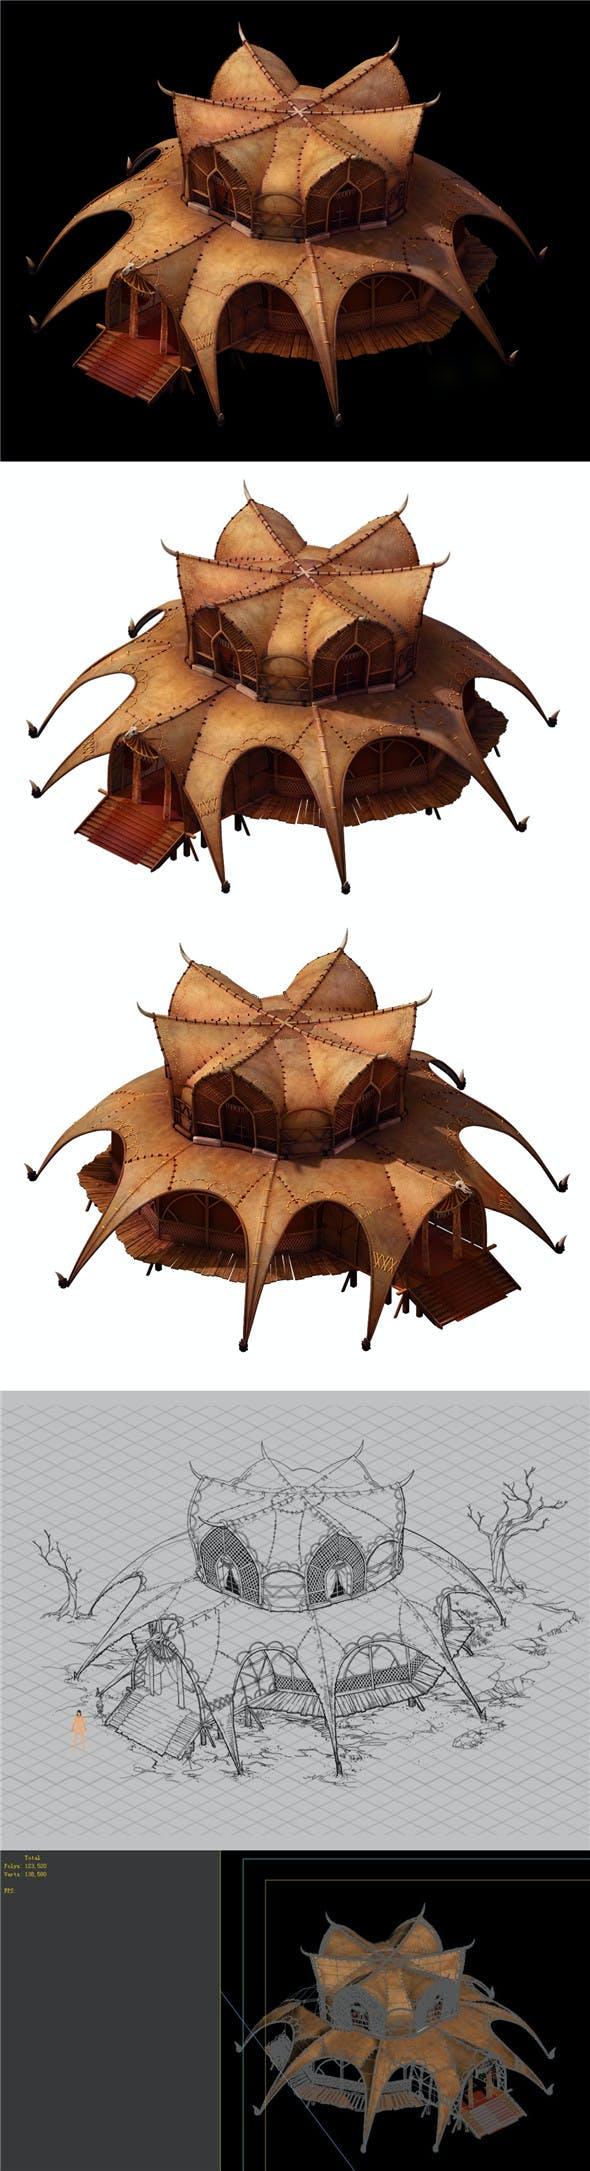 Desert Gobi - Golden Tent Palace 01 - 3DOcean Item for Sale